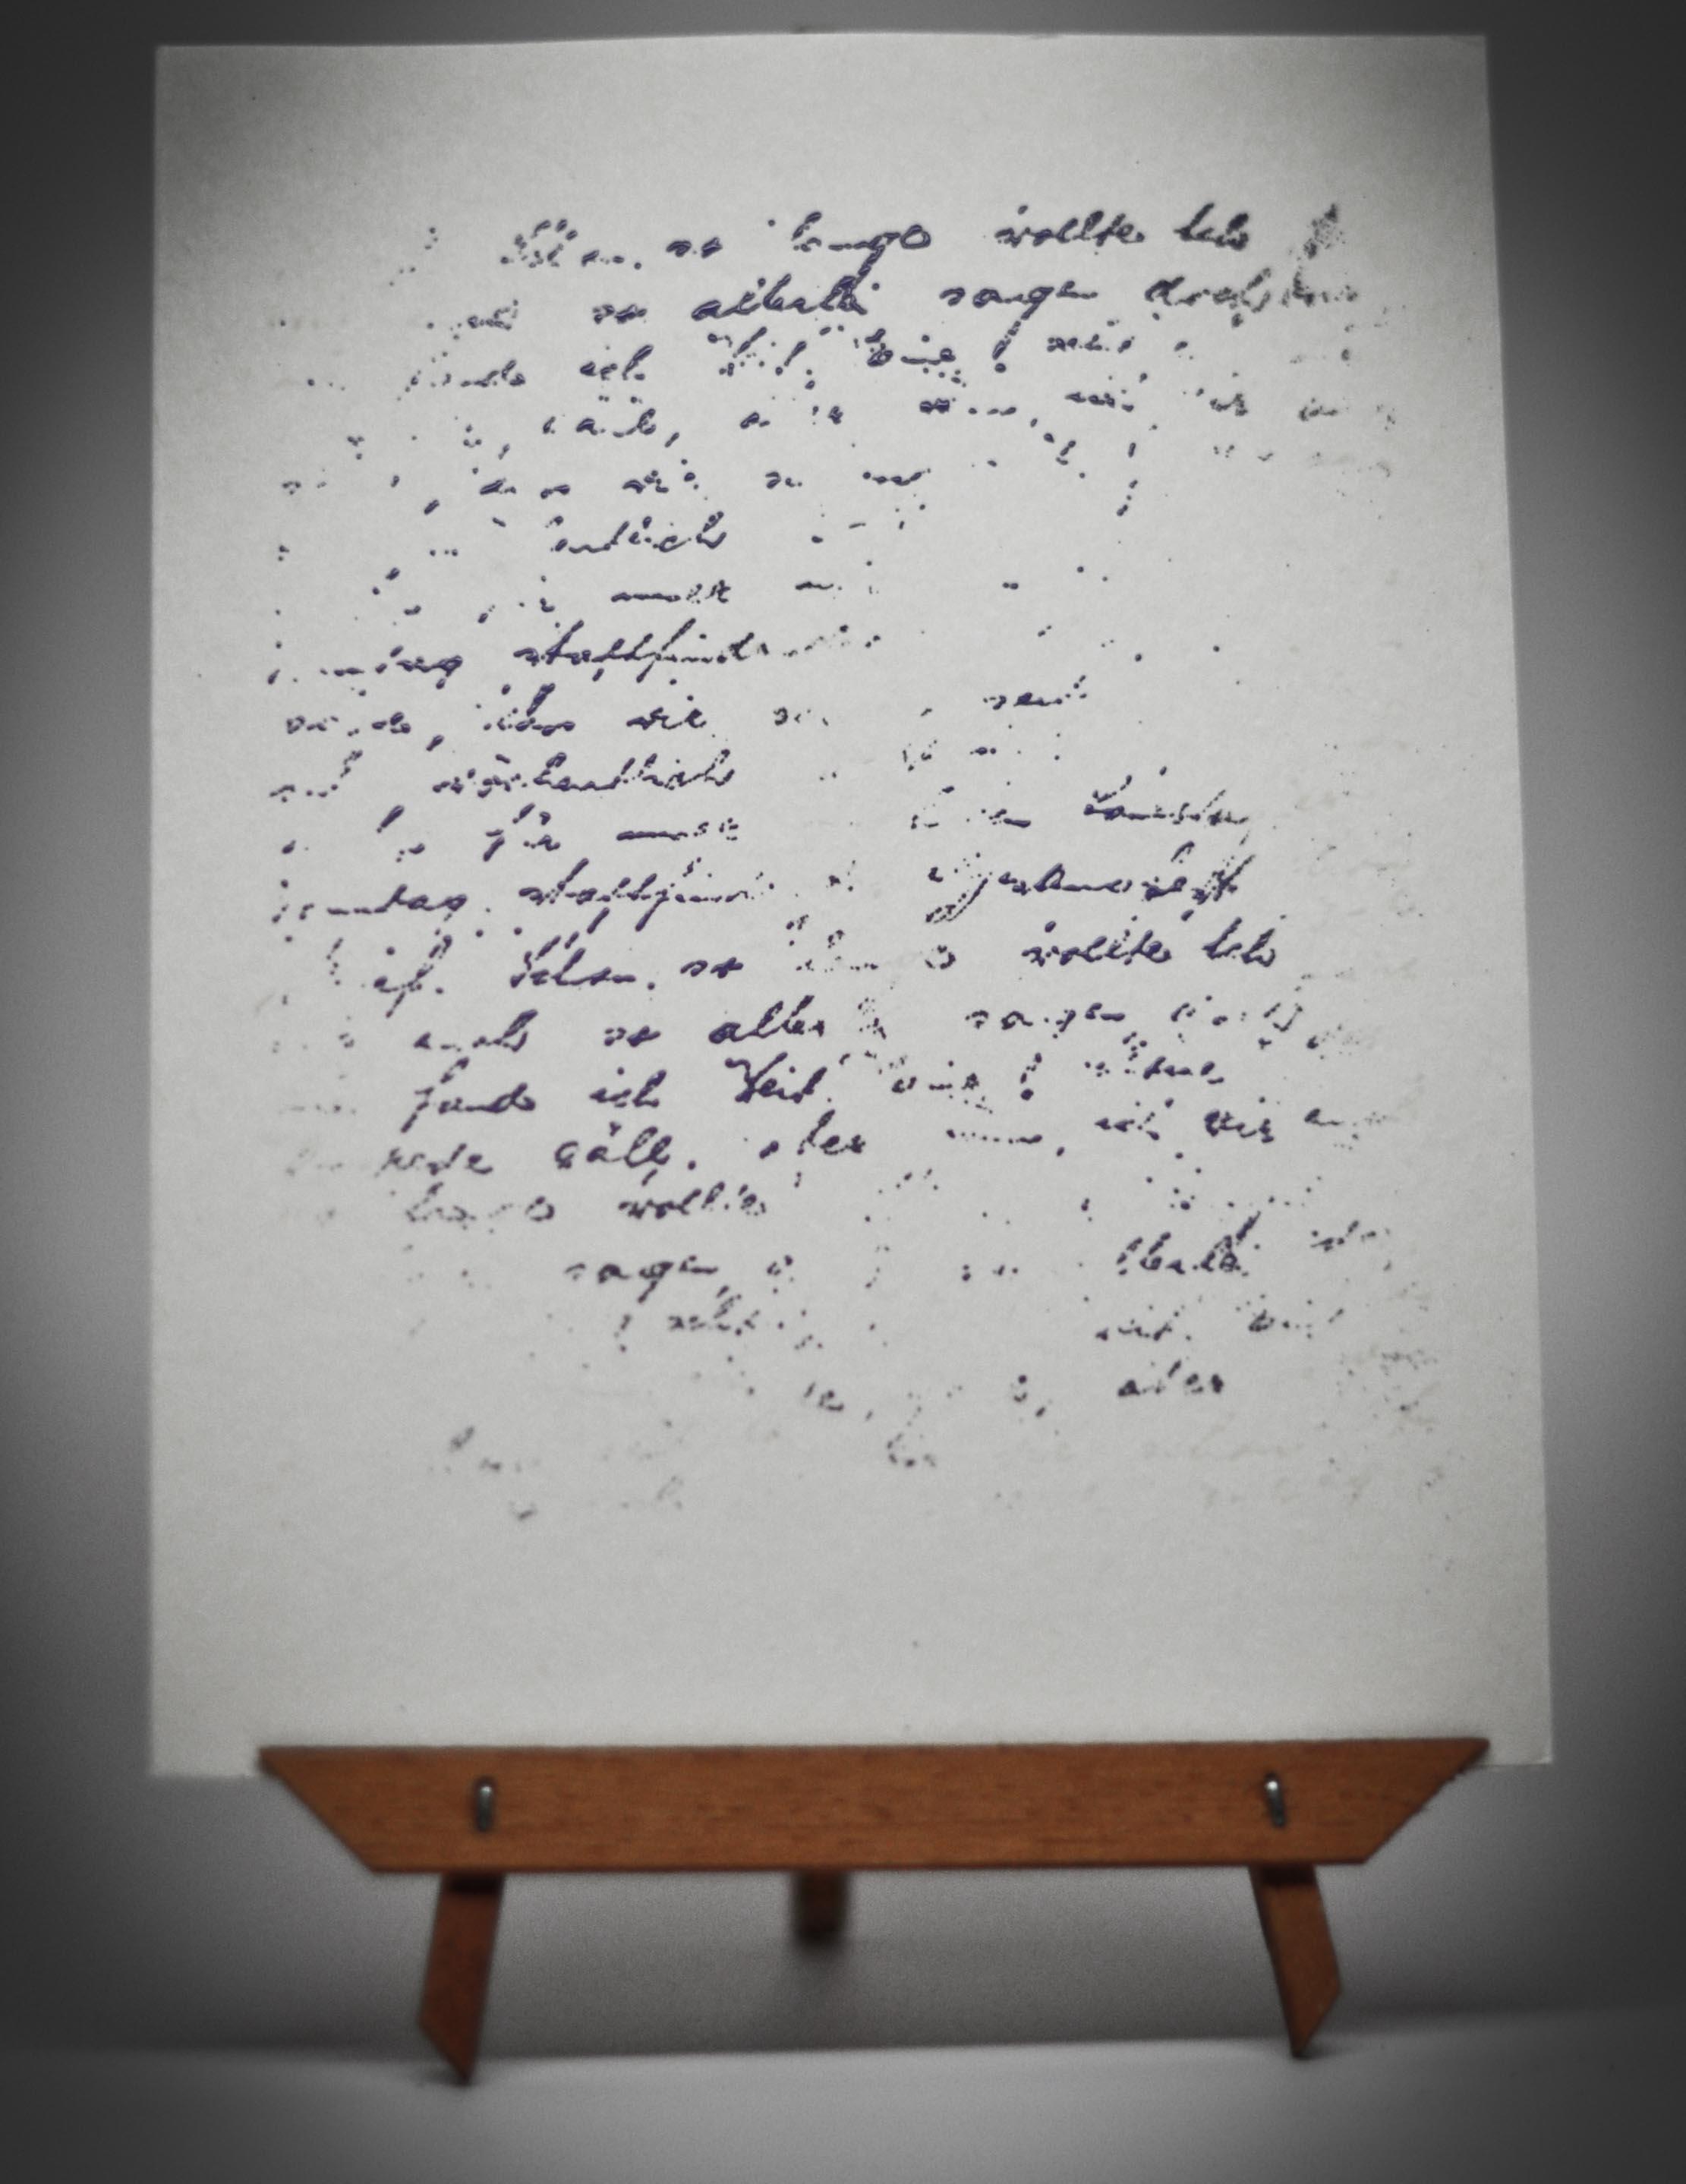 brians essay